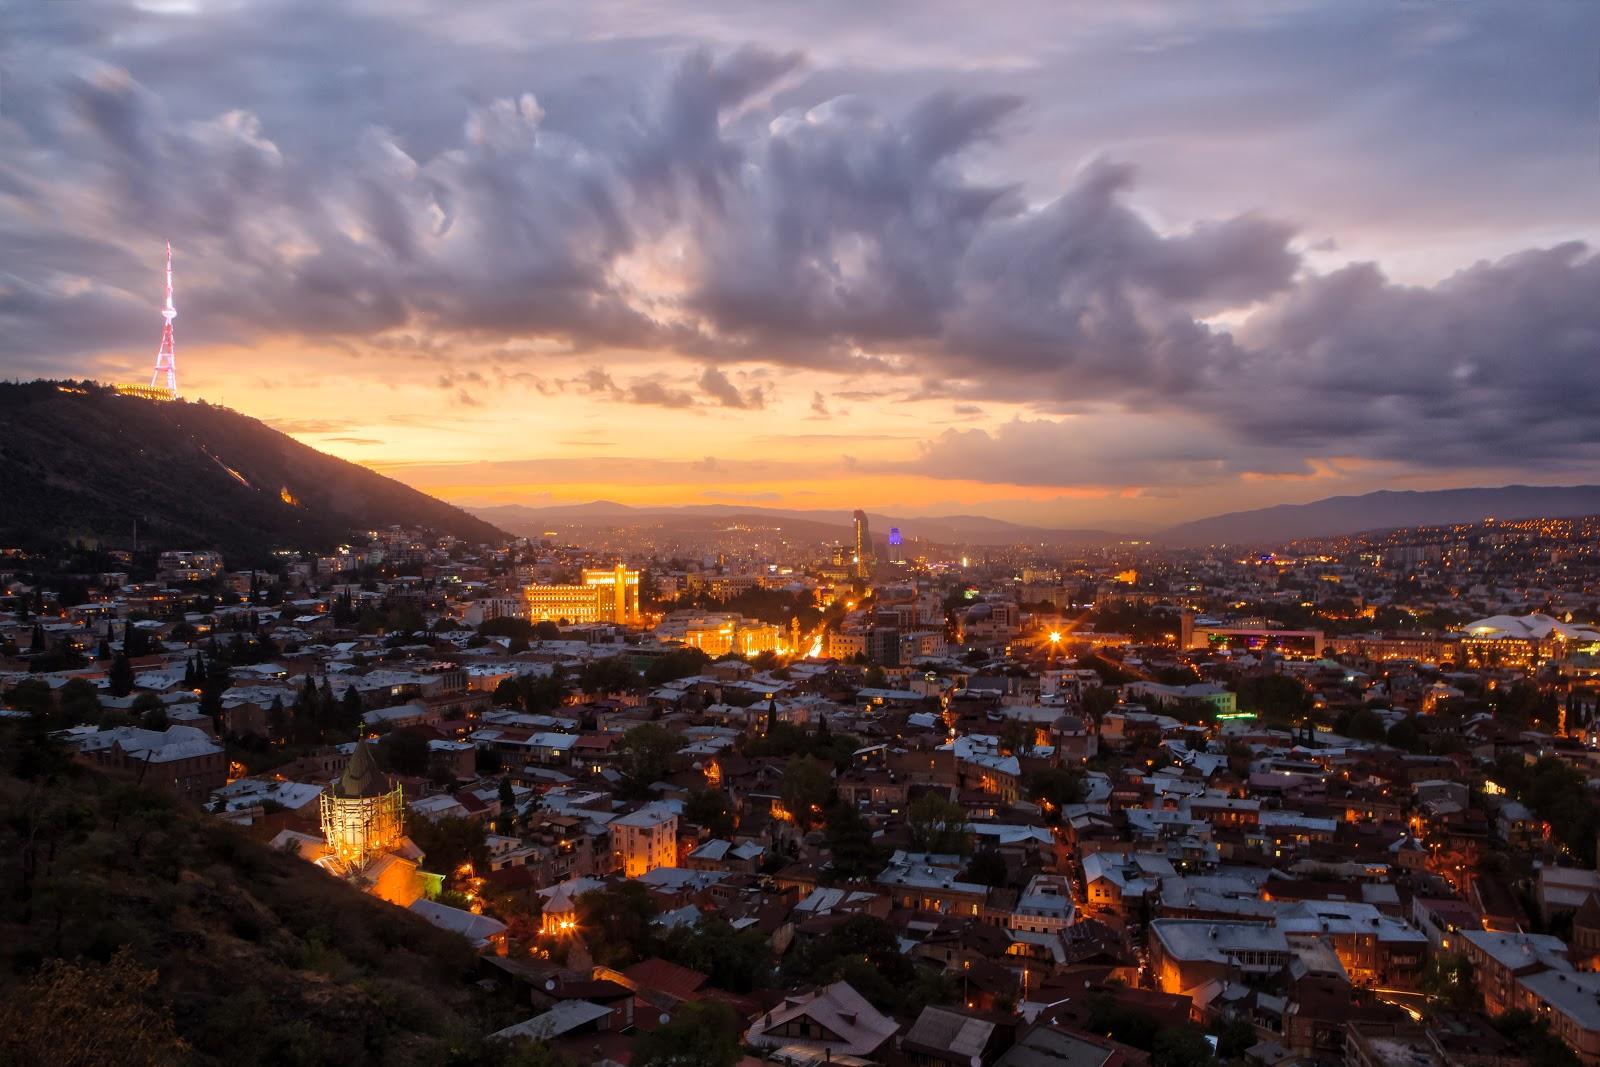 Information about Georgia's digital nomad visa for remote workers, freelancers and internet entrepreneurs.